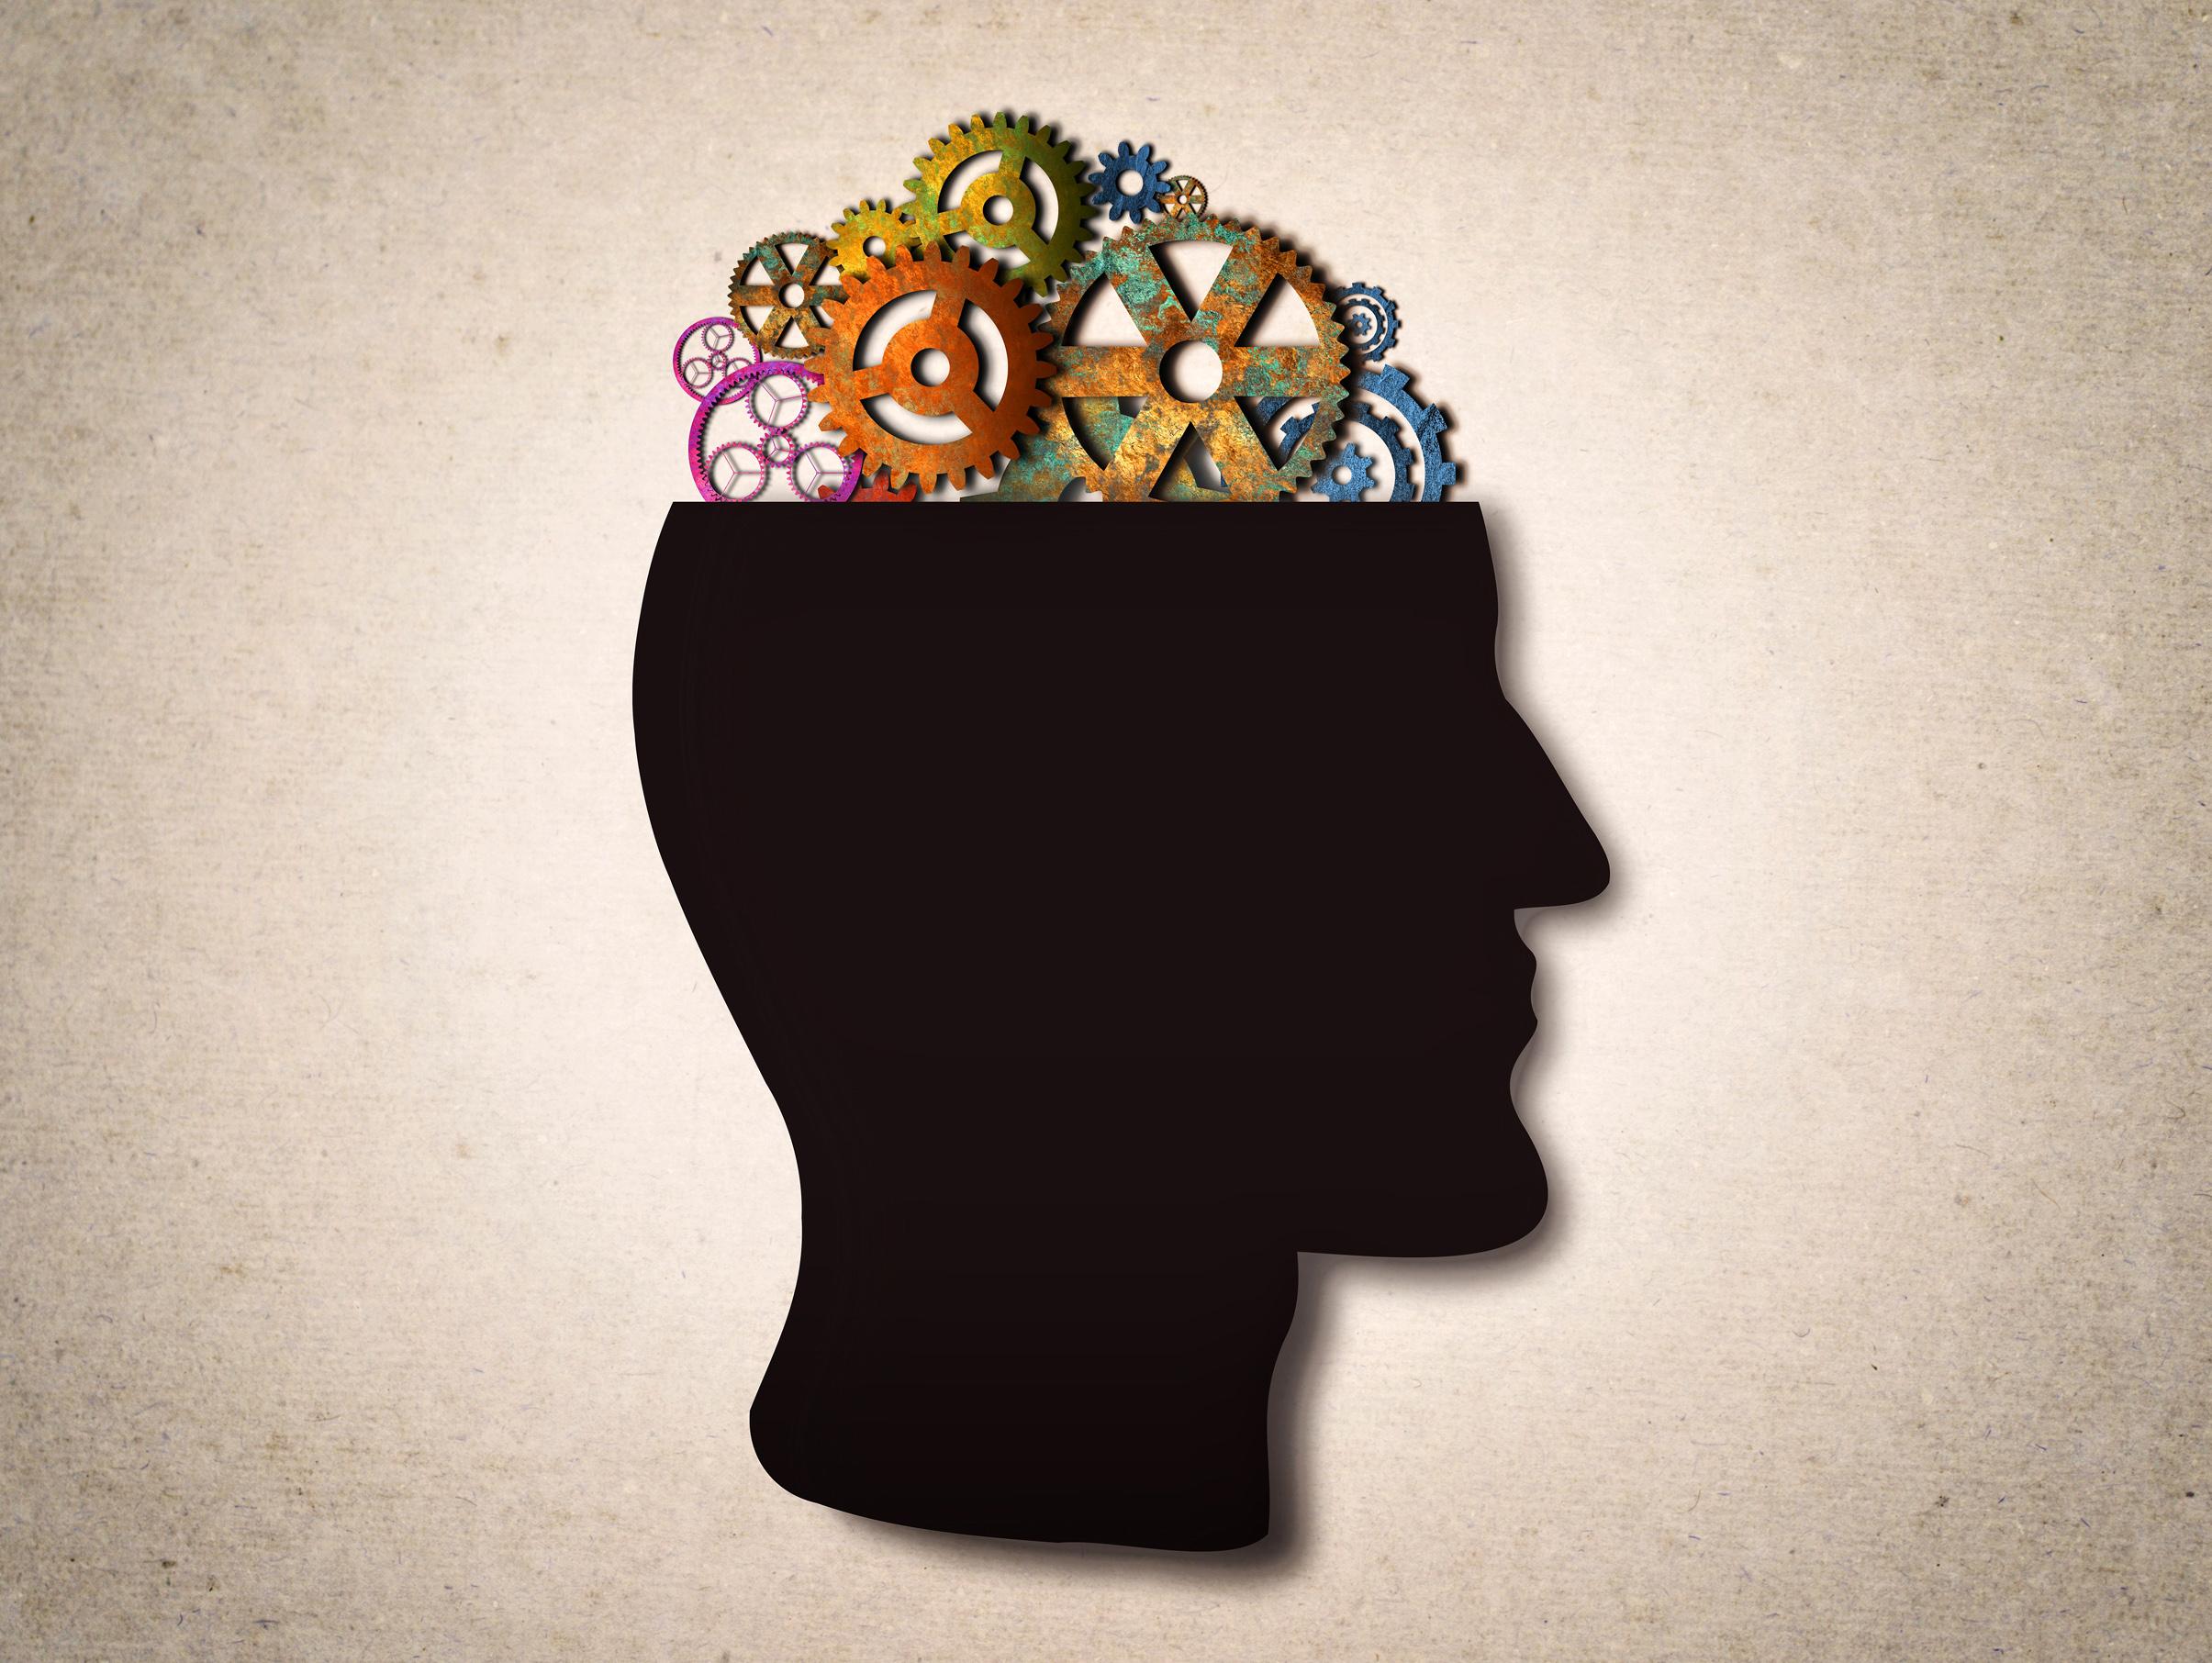 Thinking - cogwheels on the head photo